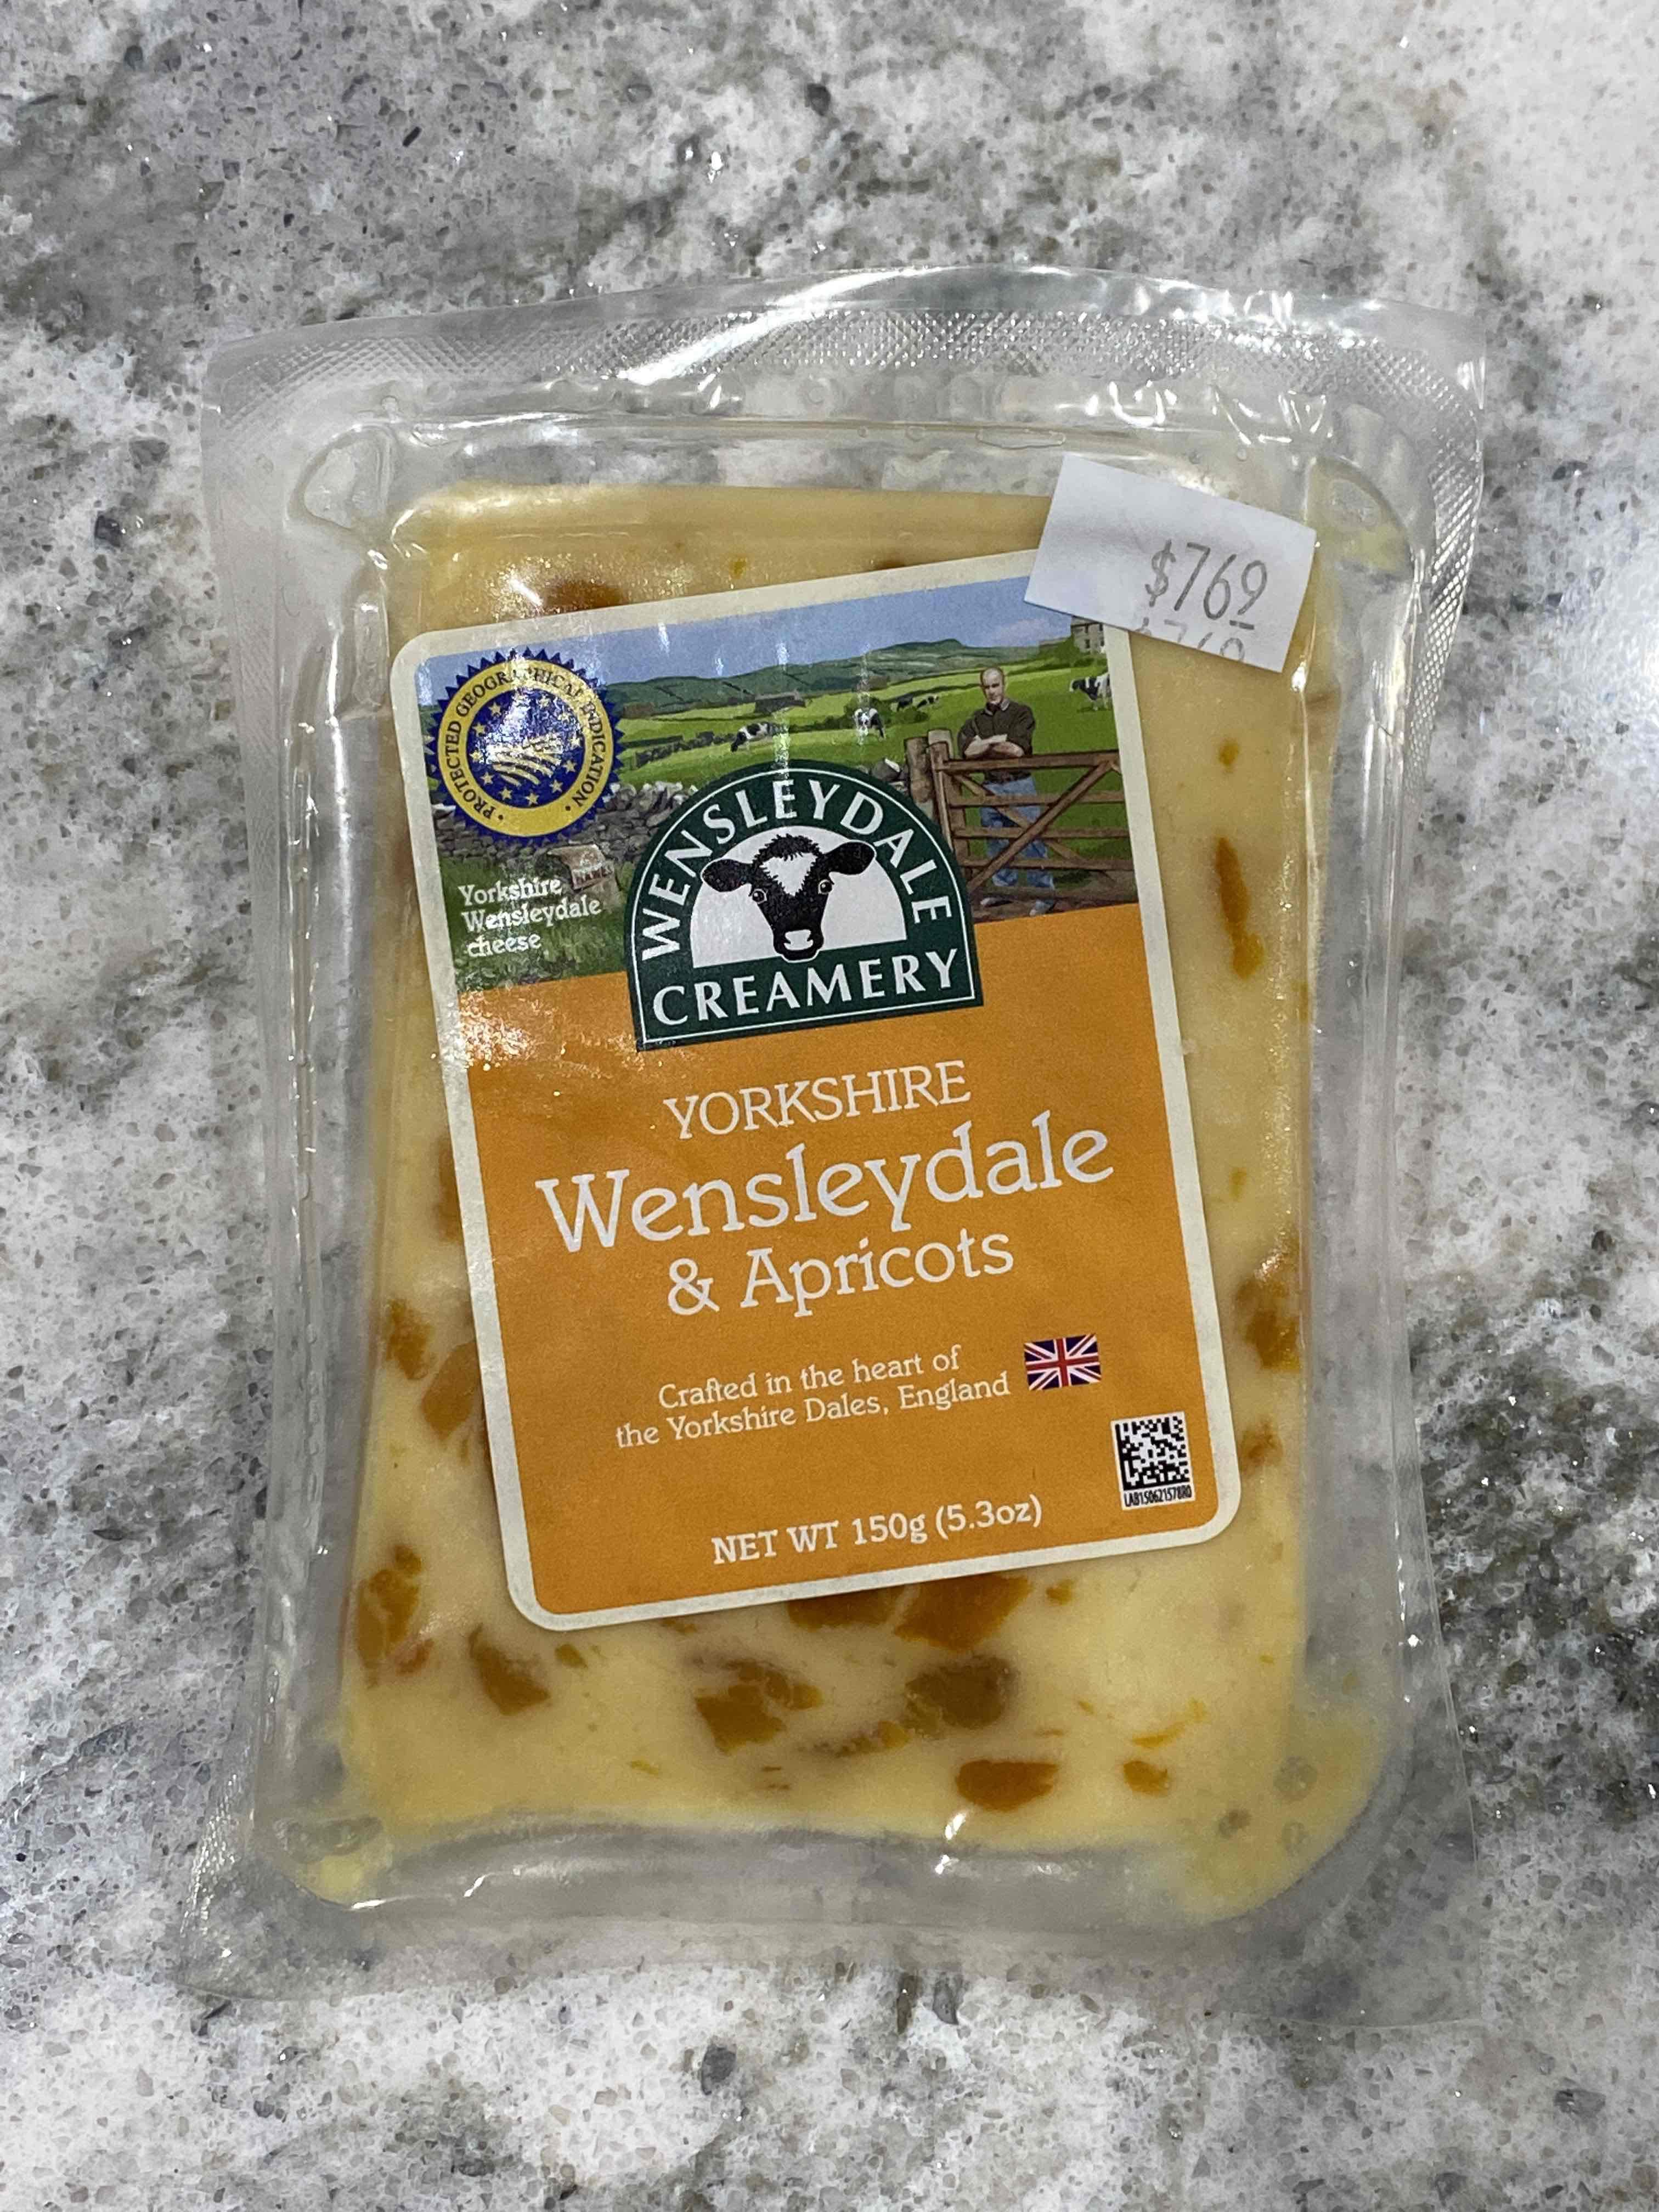 Yorkshire Wensleydale & Apricots